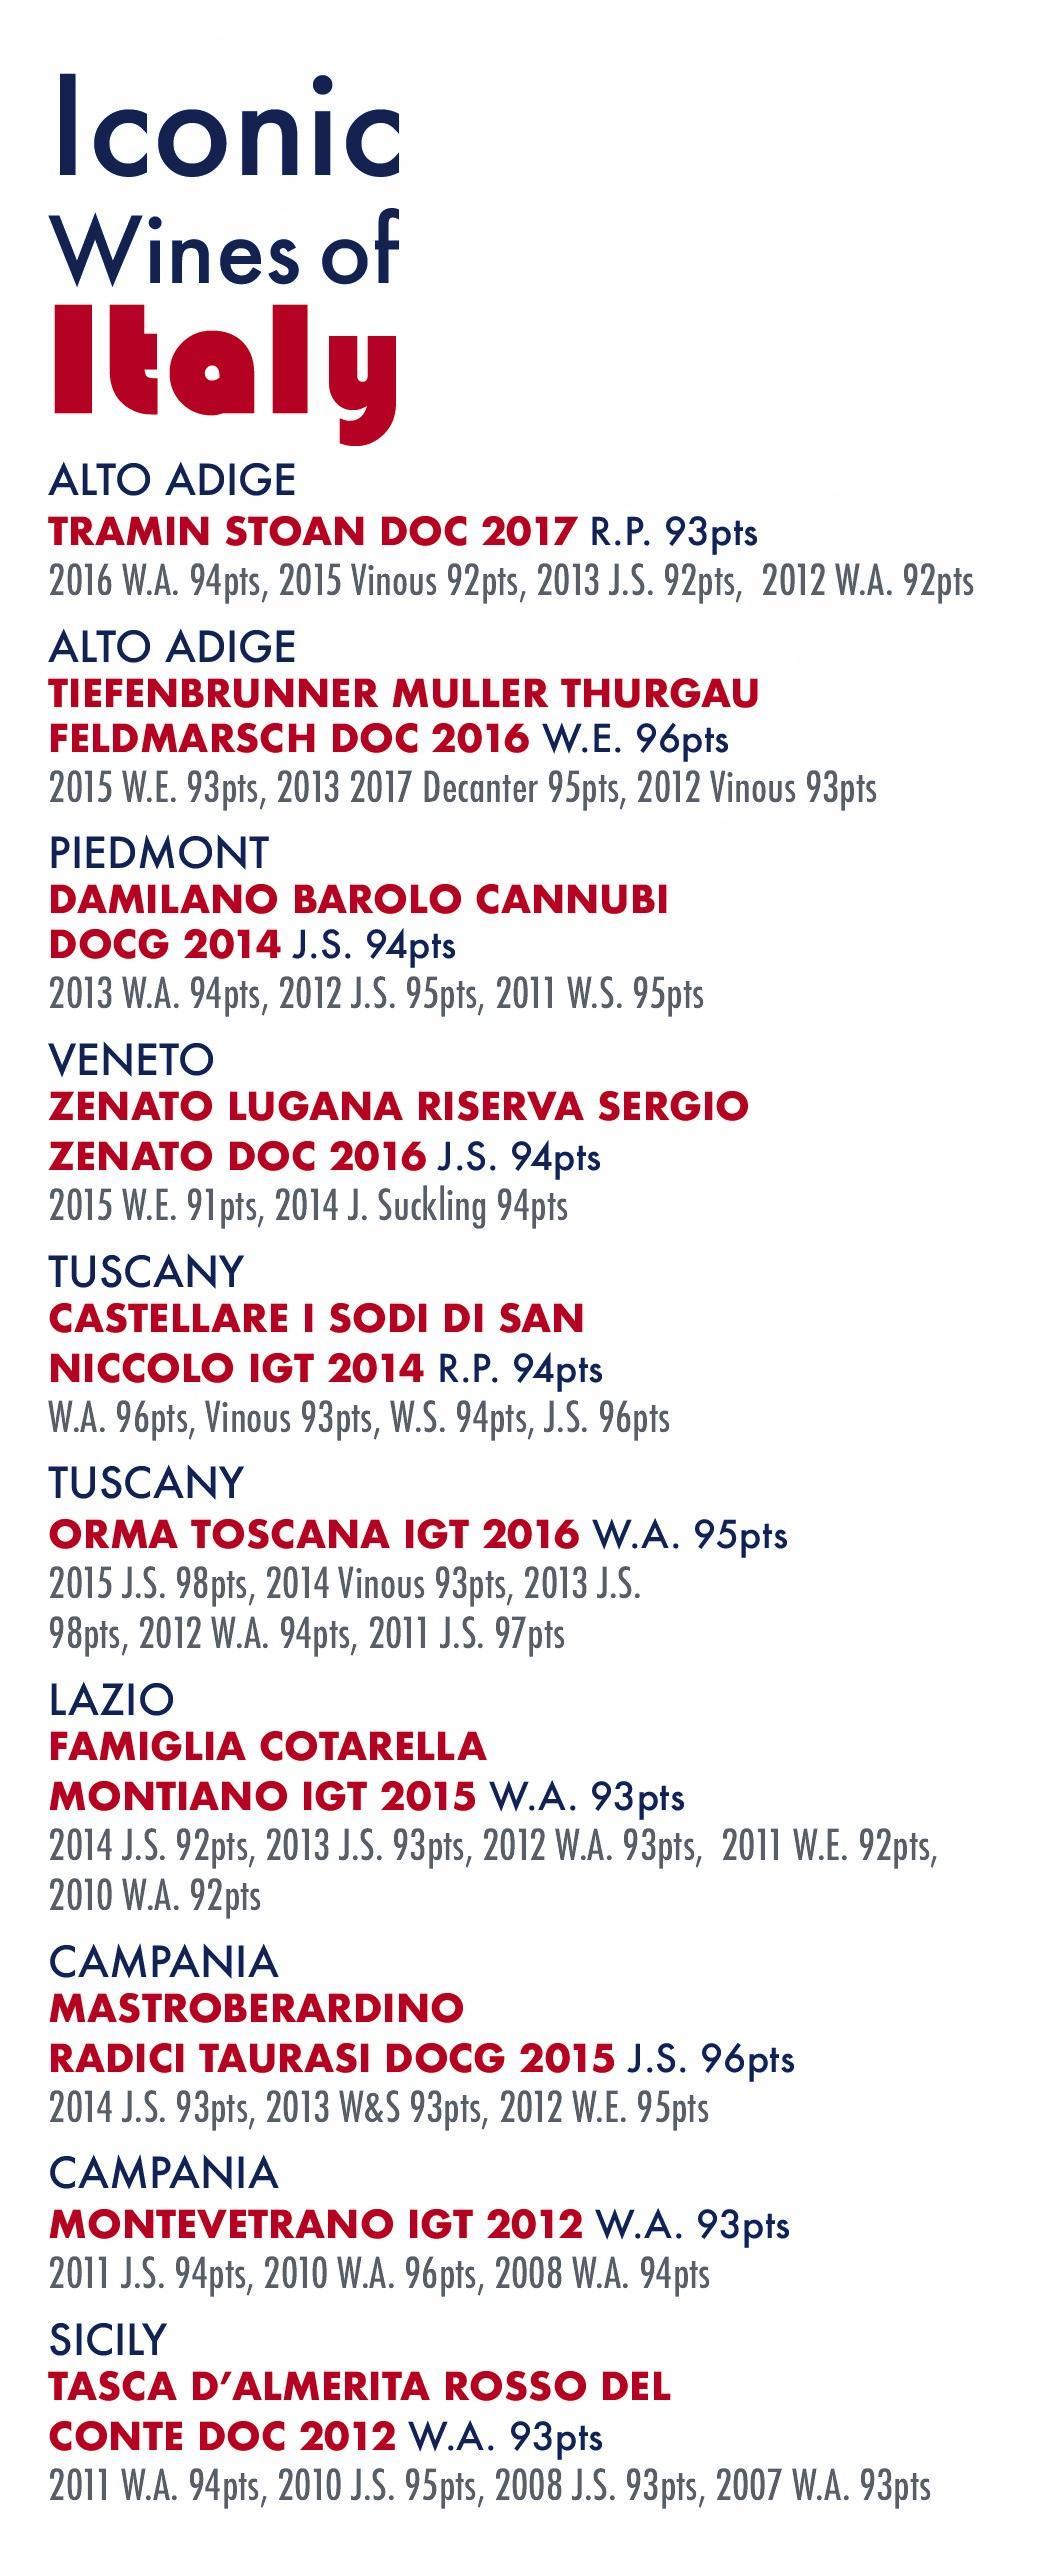 Iconic Wines of Italy Wine Tasting